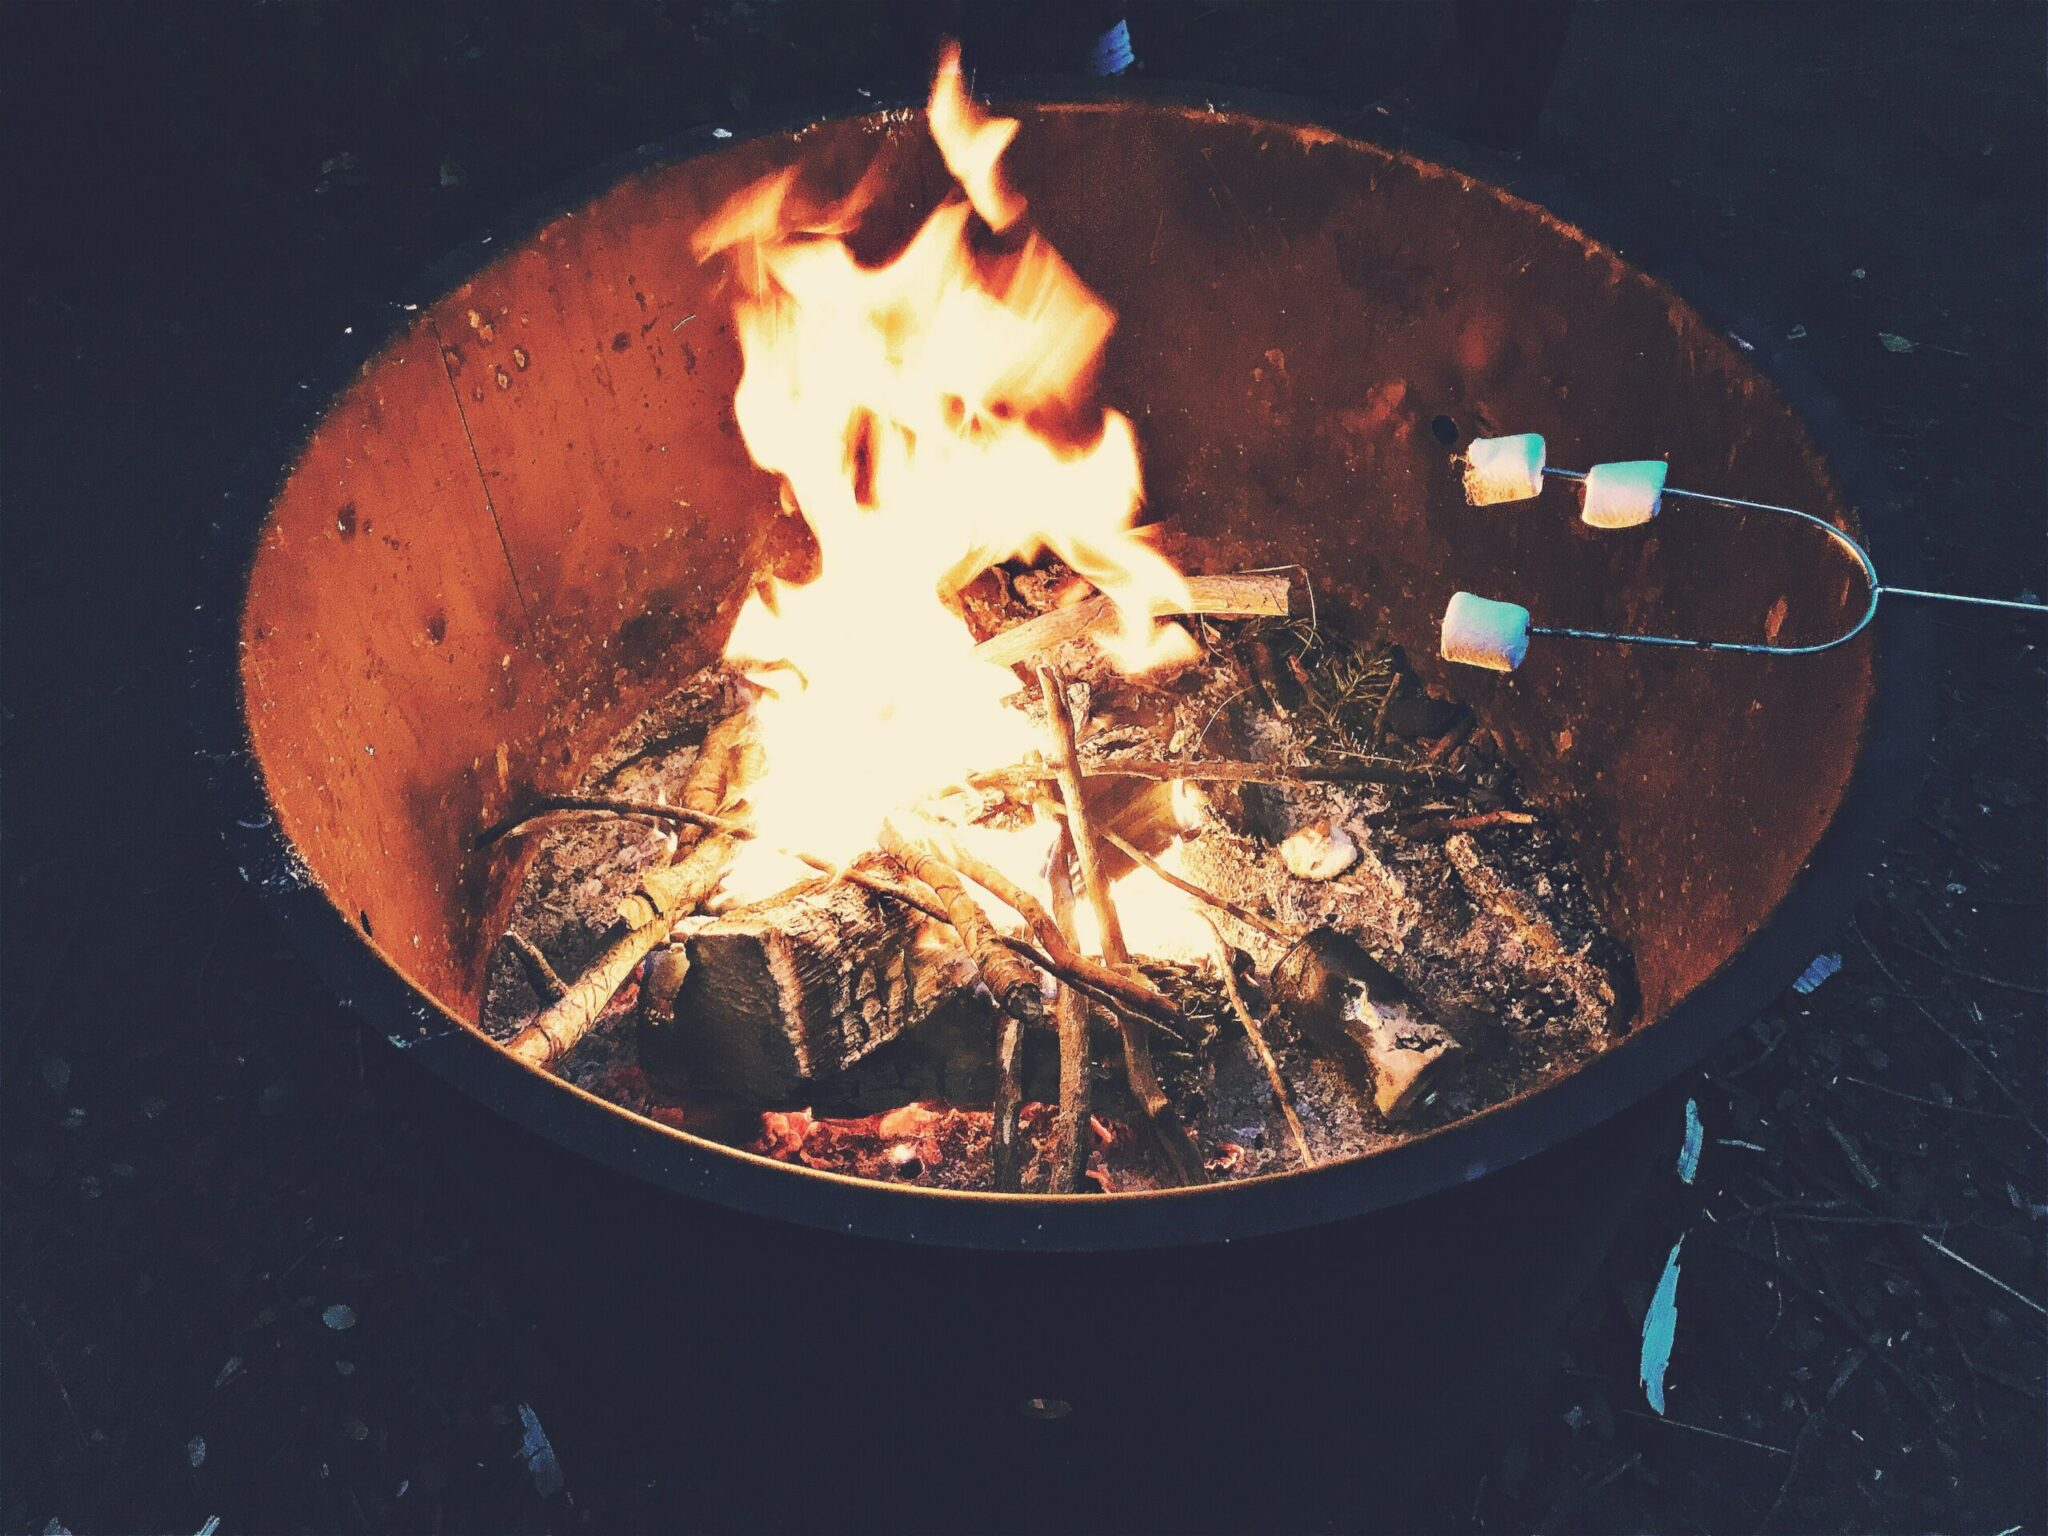 Vuurkorf barbecue as